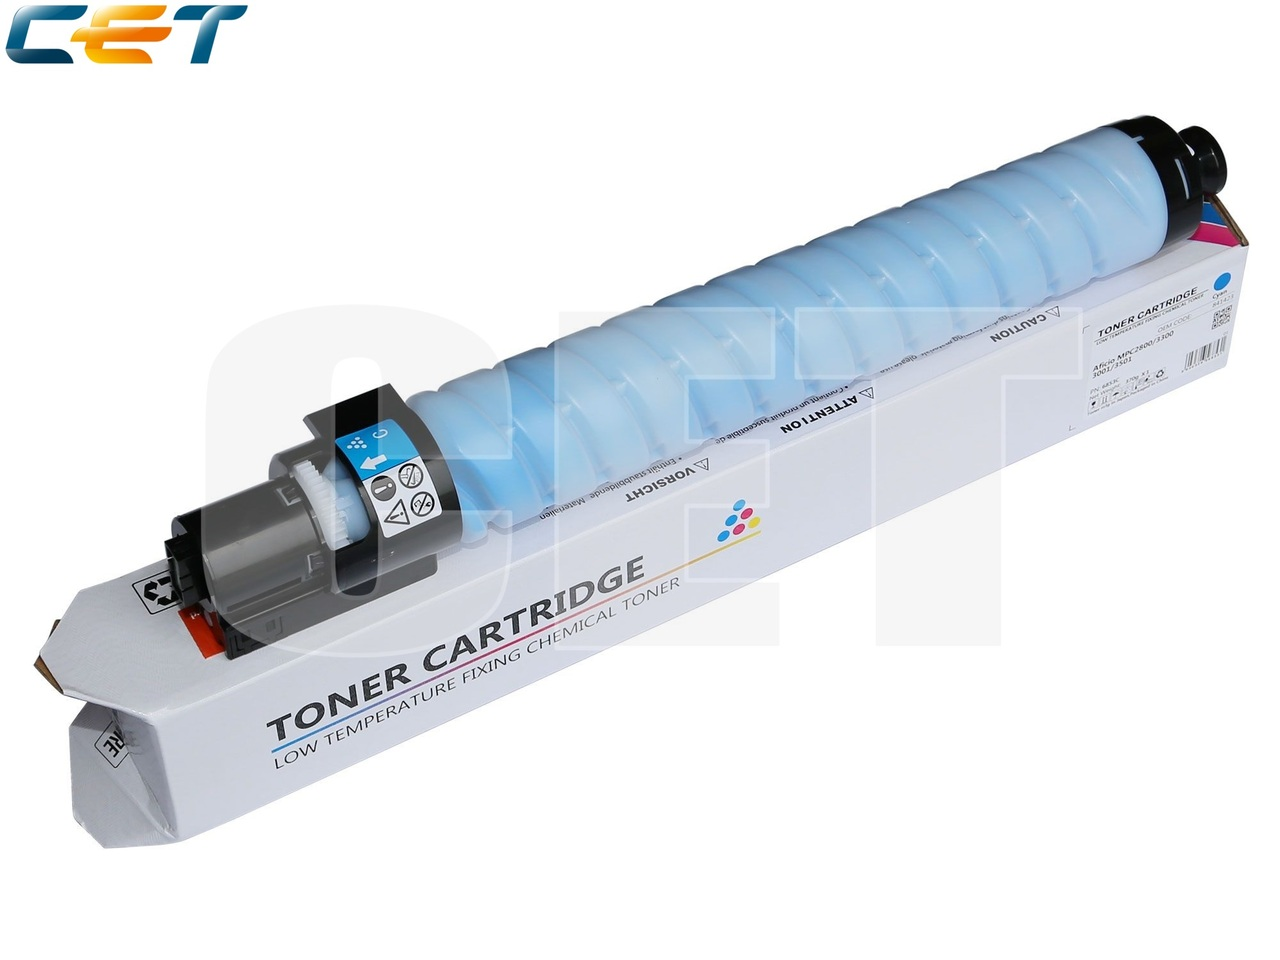 Тонер-картридж (CPT) 841427 для RICOH Aficio MPC2800/3300(CET) Cyan, (WW), 370г, 15000 стр., CET6853C